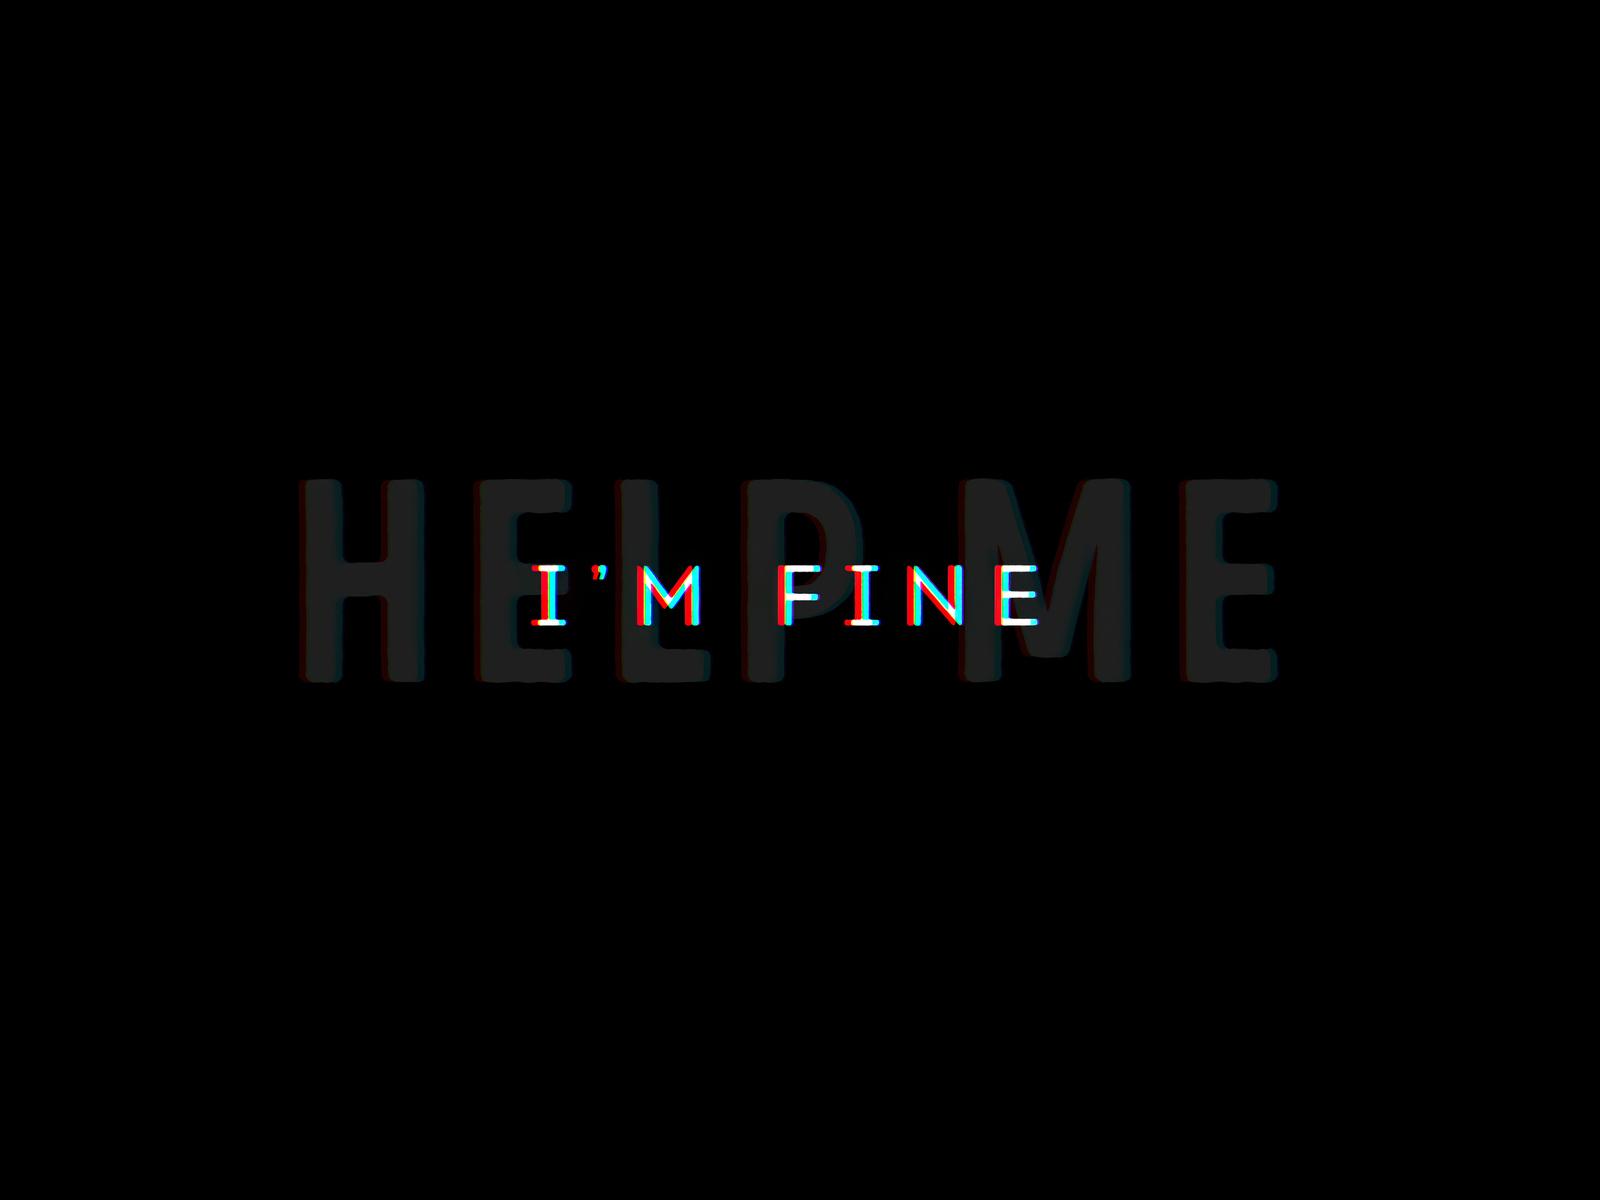 i-am-fine-4k-hy.jpg